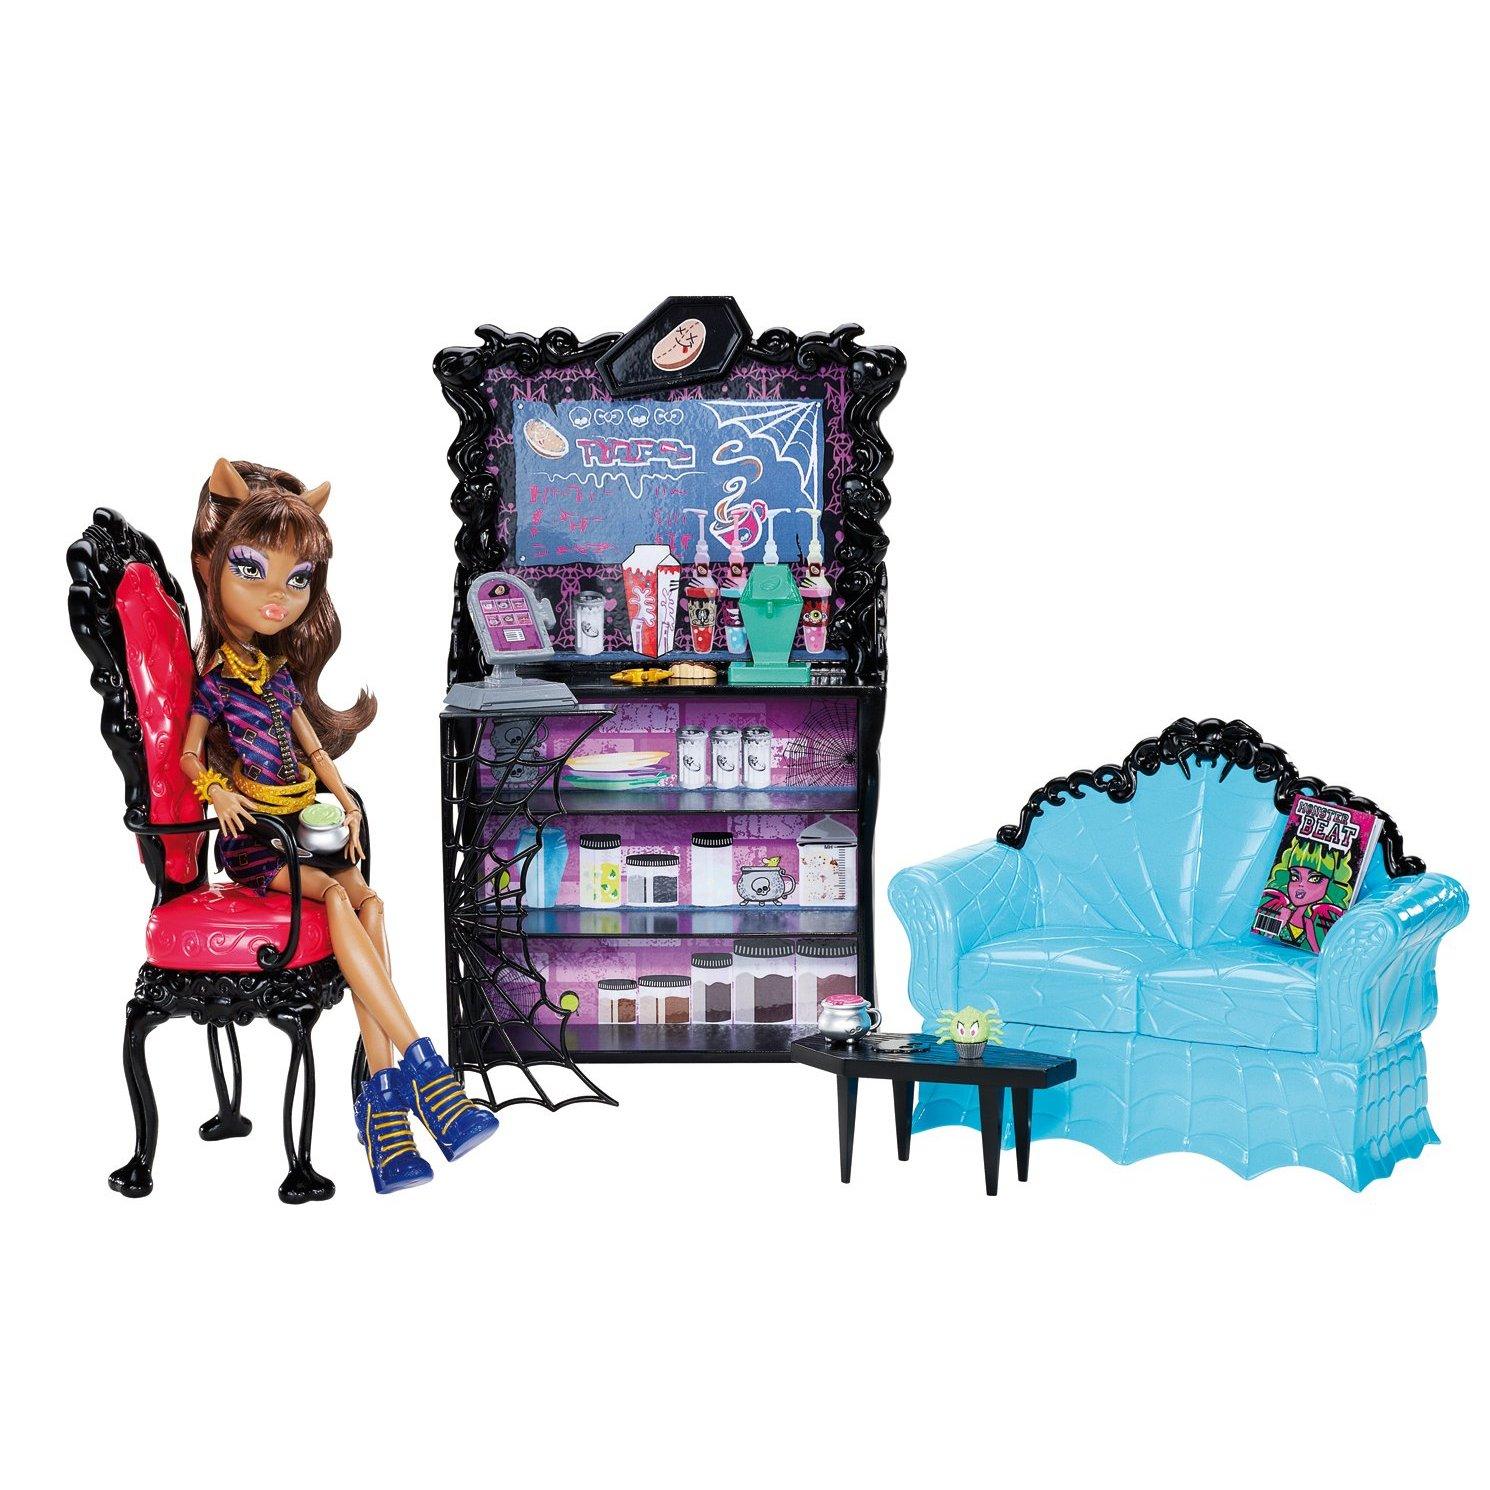 monster high bean bag chair rolling desk on carpet clawdeen wolf coffin play set